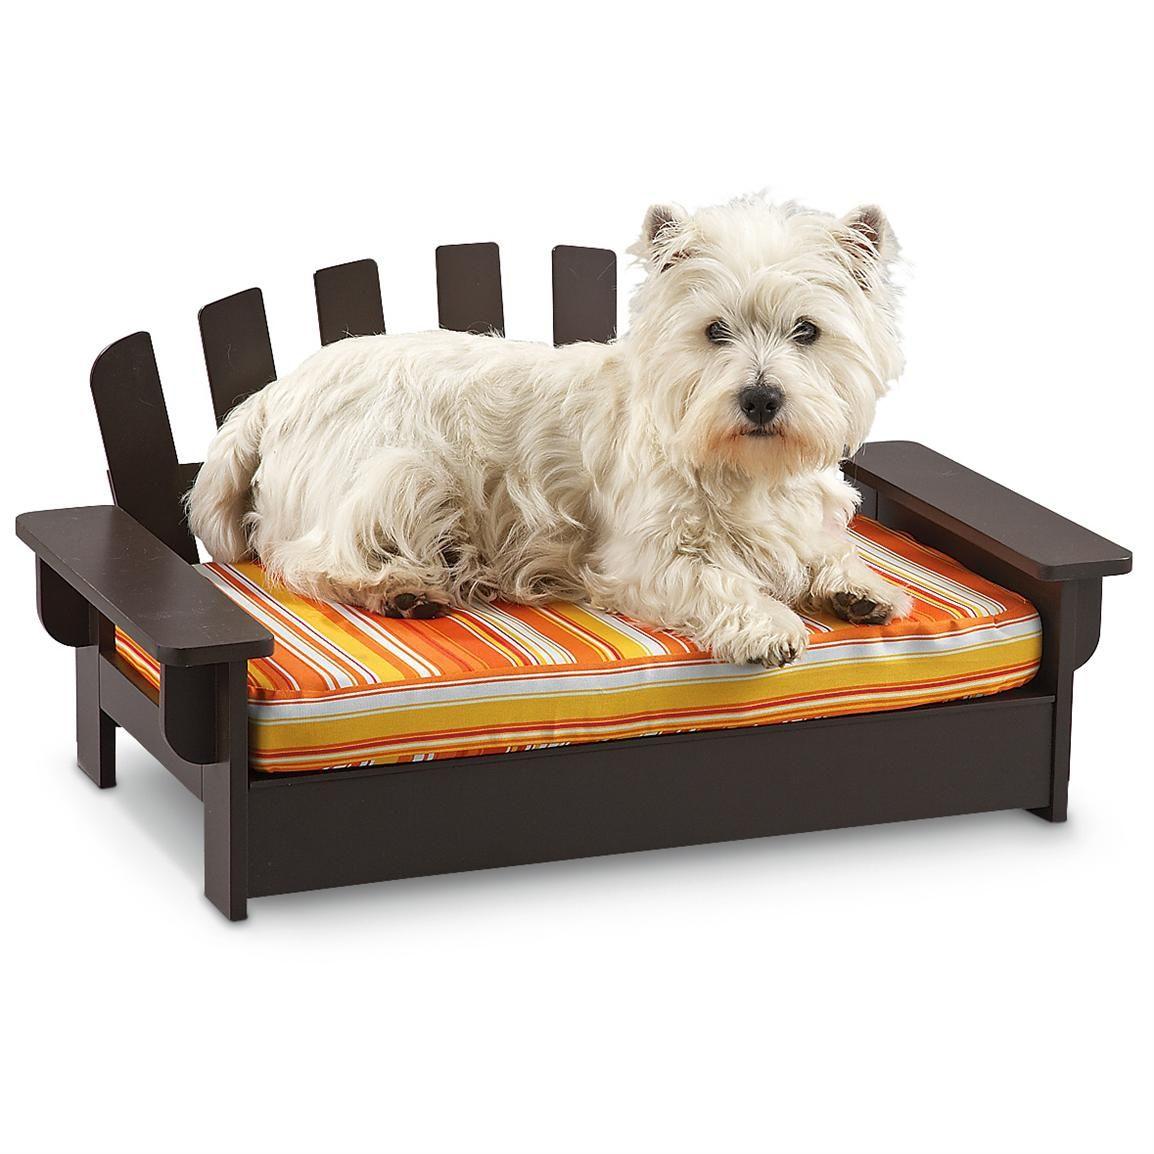 Wood Adirondack Pet Bed 969630, Dog Beds at Sportsman's